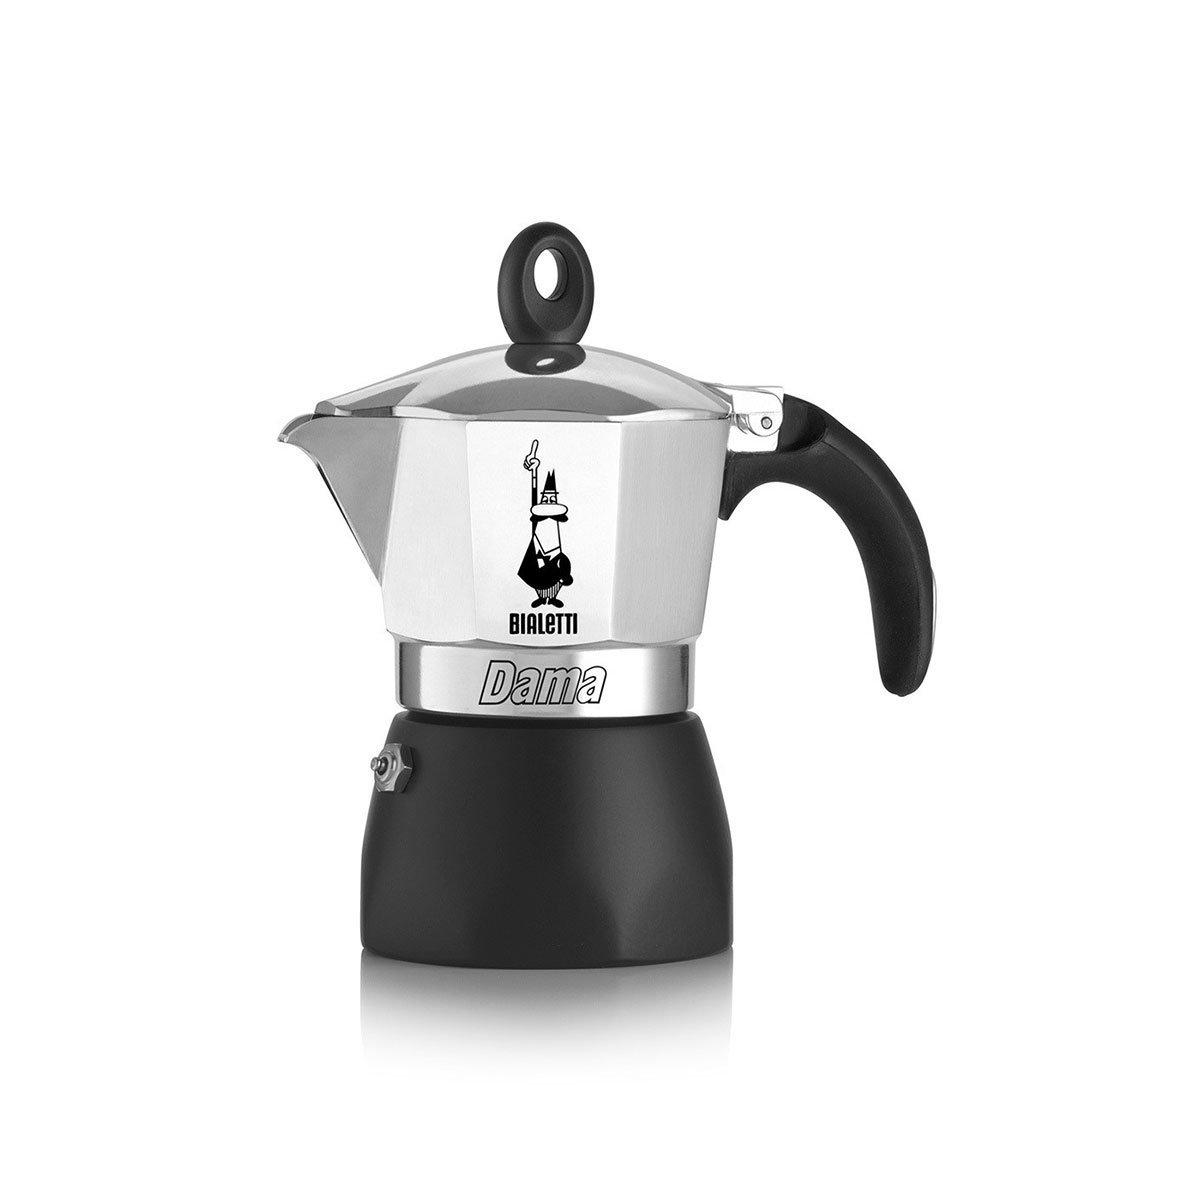 Гейзерная кофеварка Bialetti Dama Gran Gala (3 чашки - 170 мл)